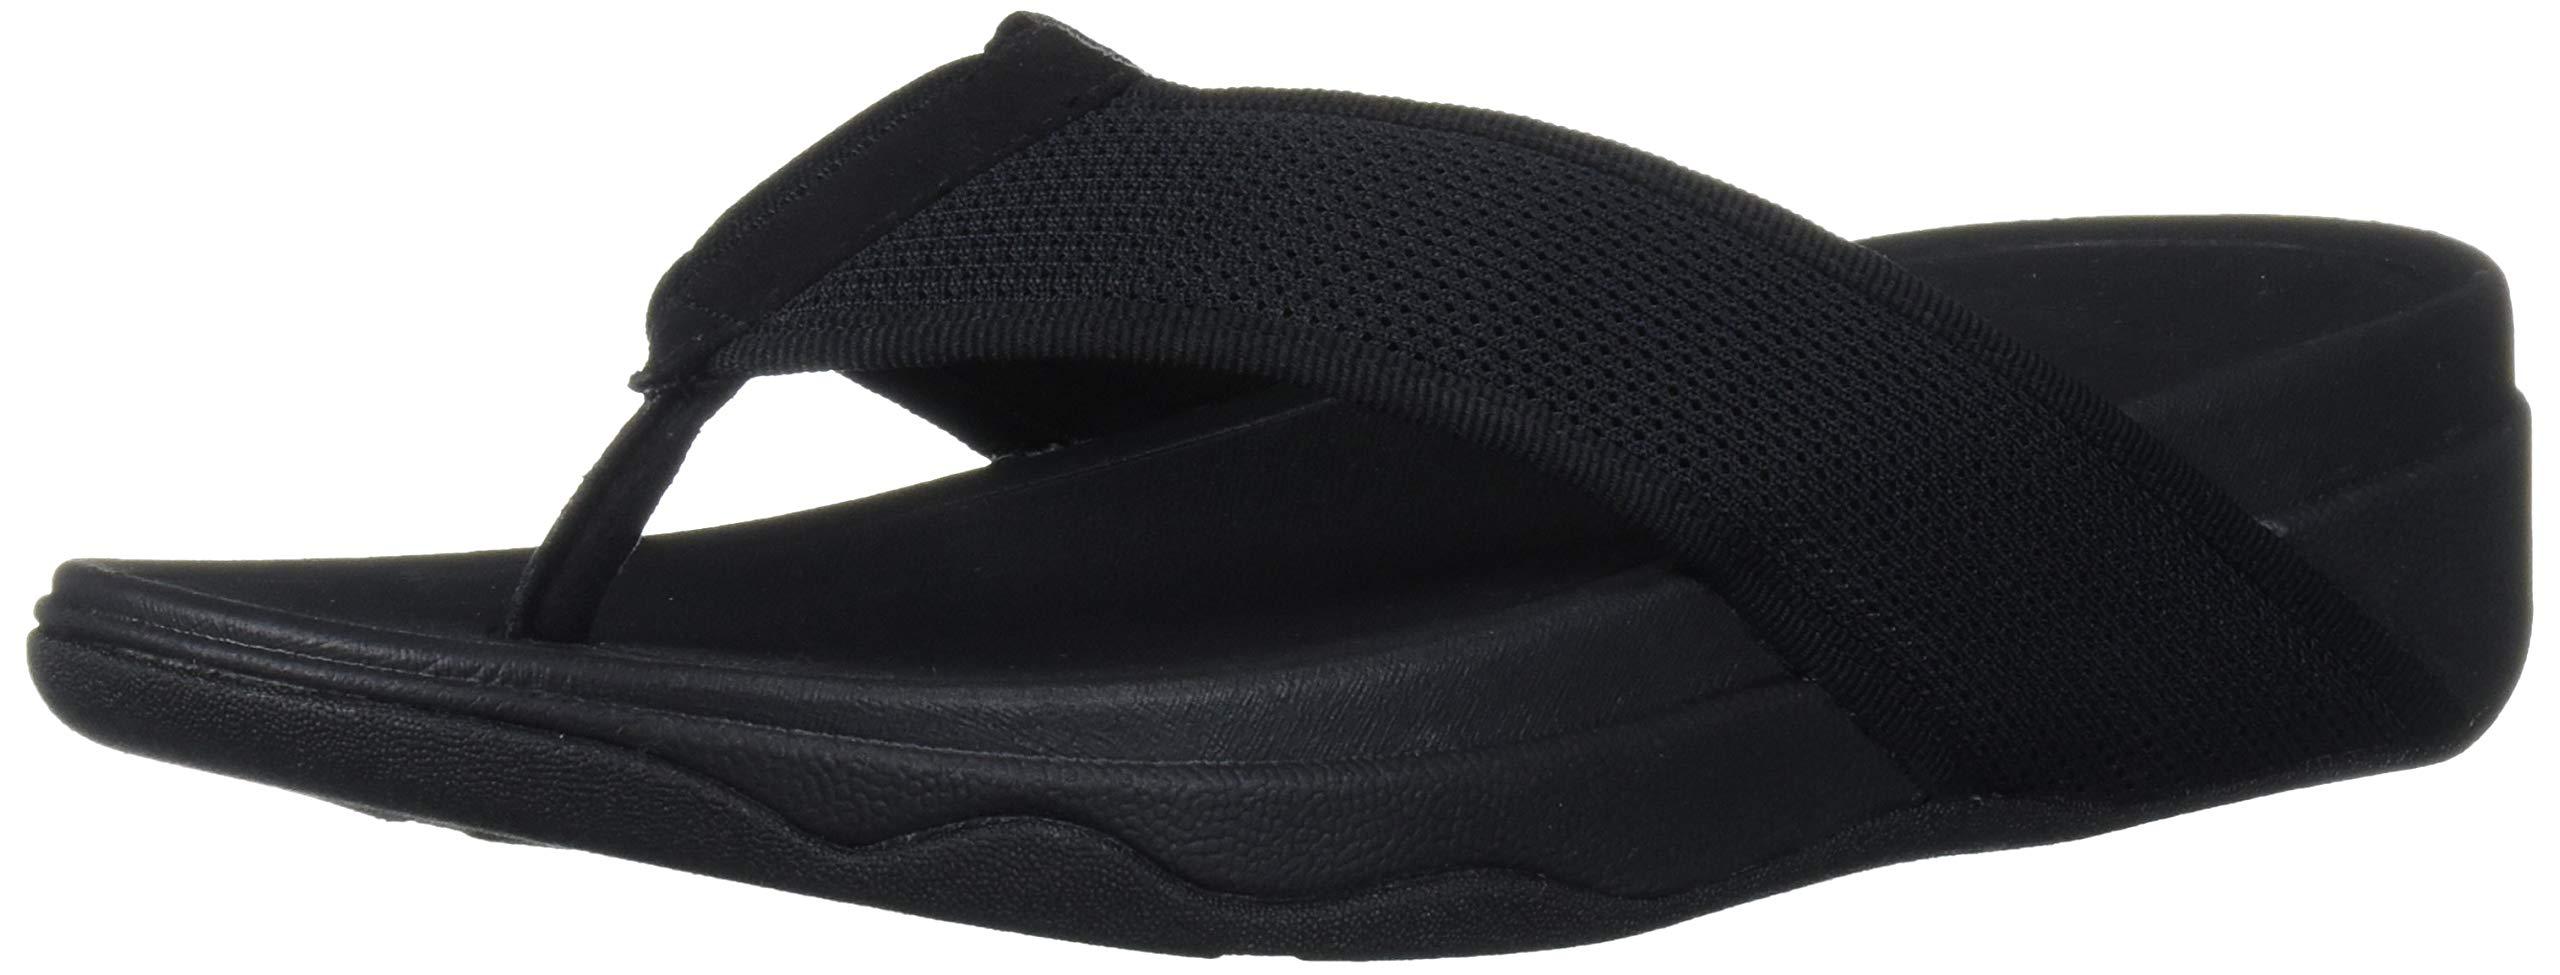 FitFlop Women's VIRRA MESH Sandal Black Thong Flip Flop Wedg